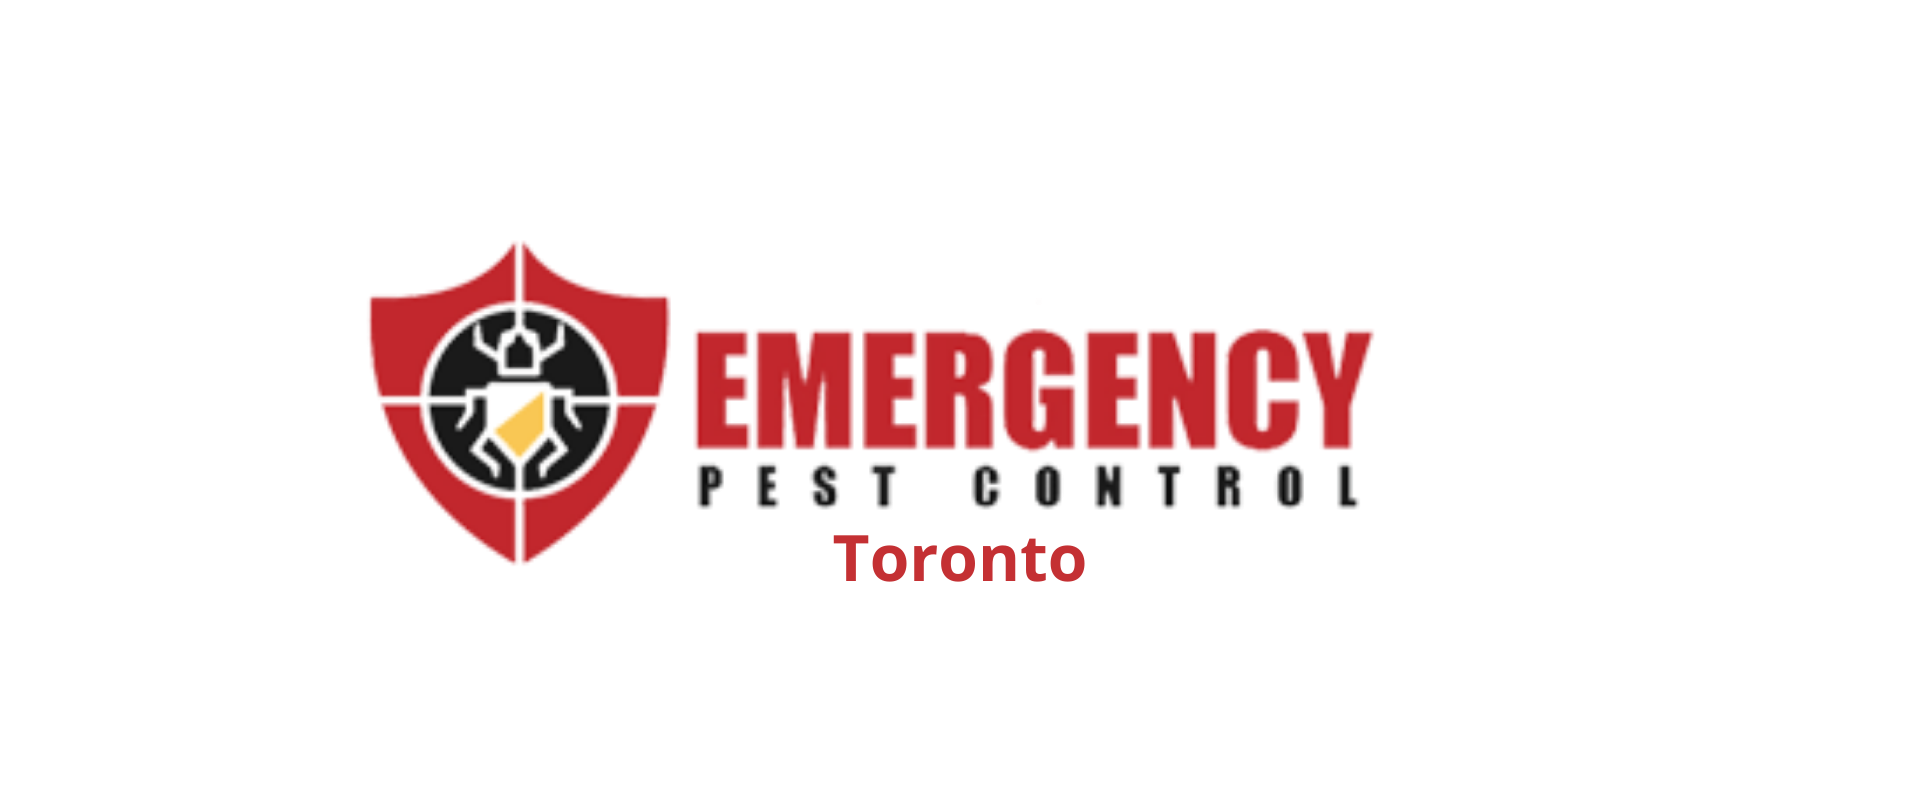 emergency pest control toronto logo